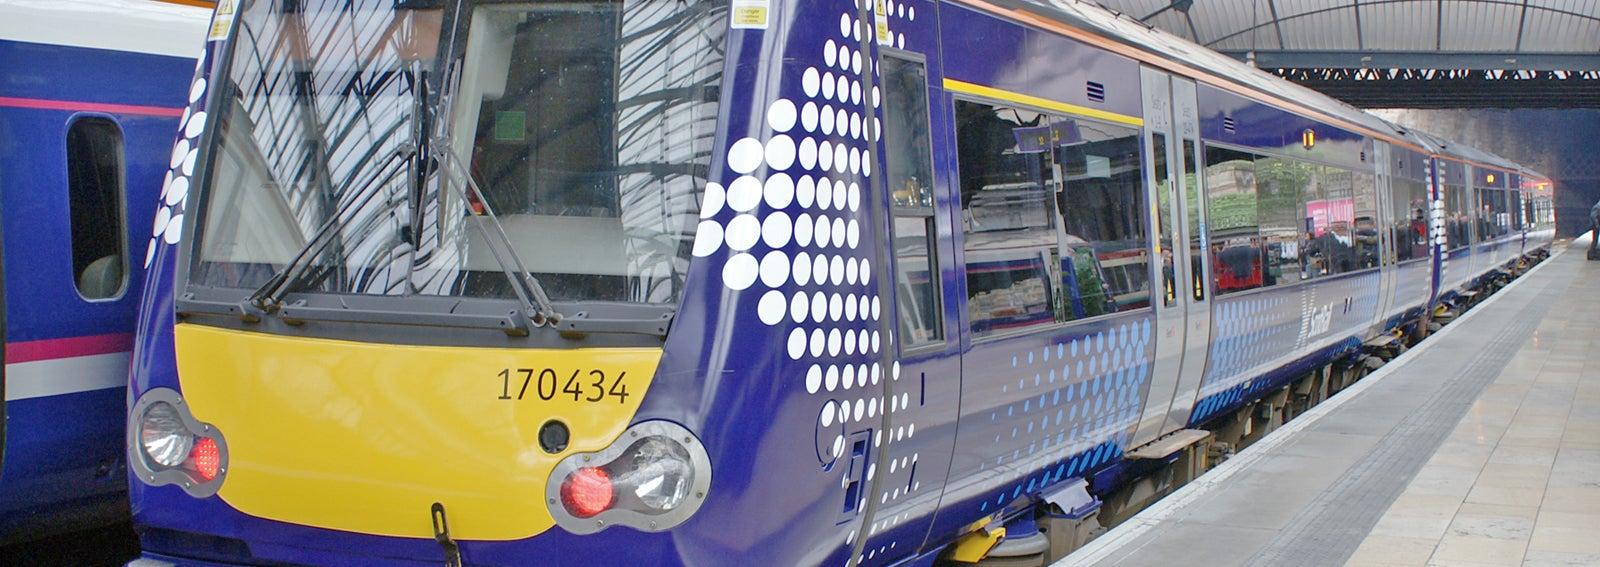 train-event_image.jpg